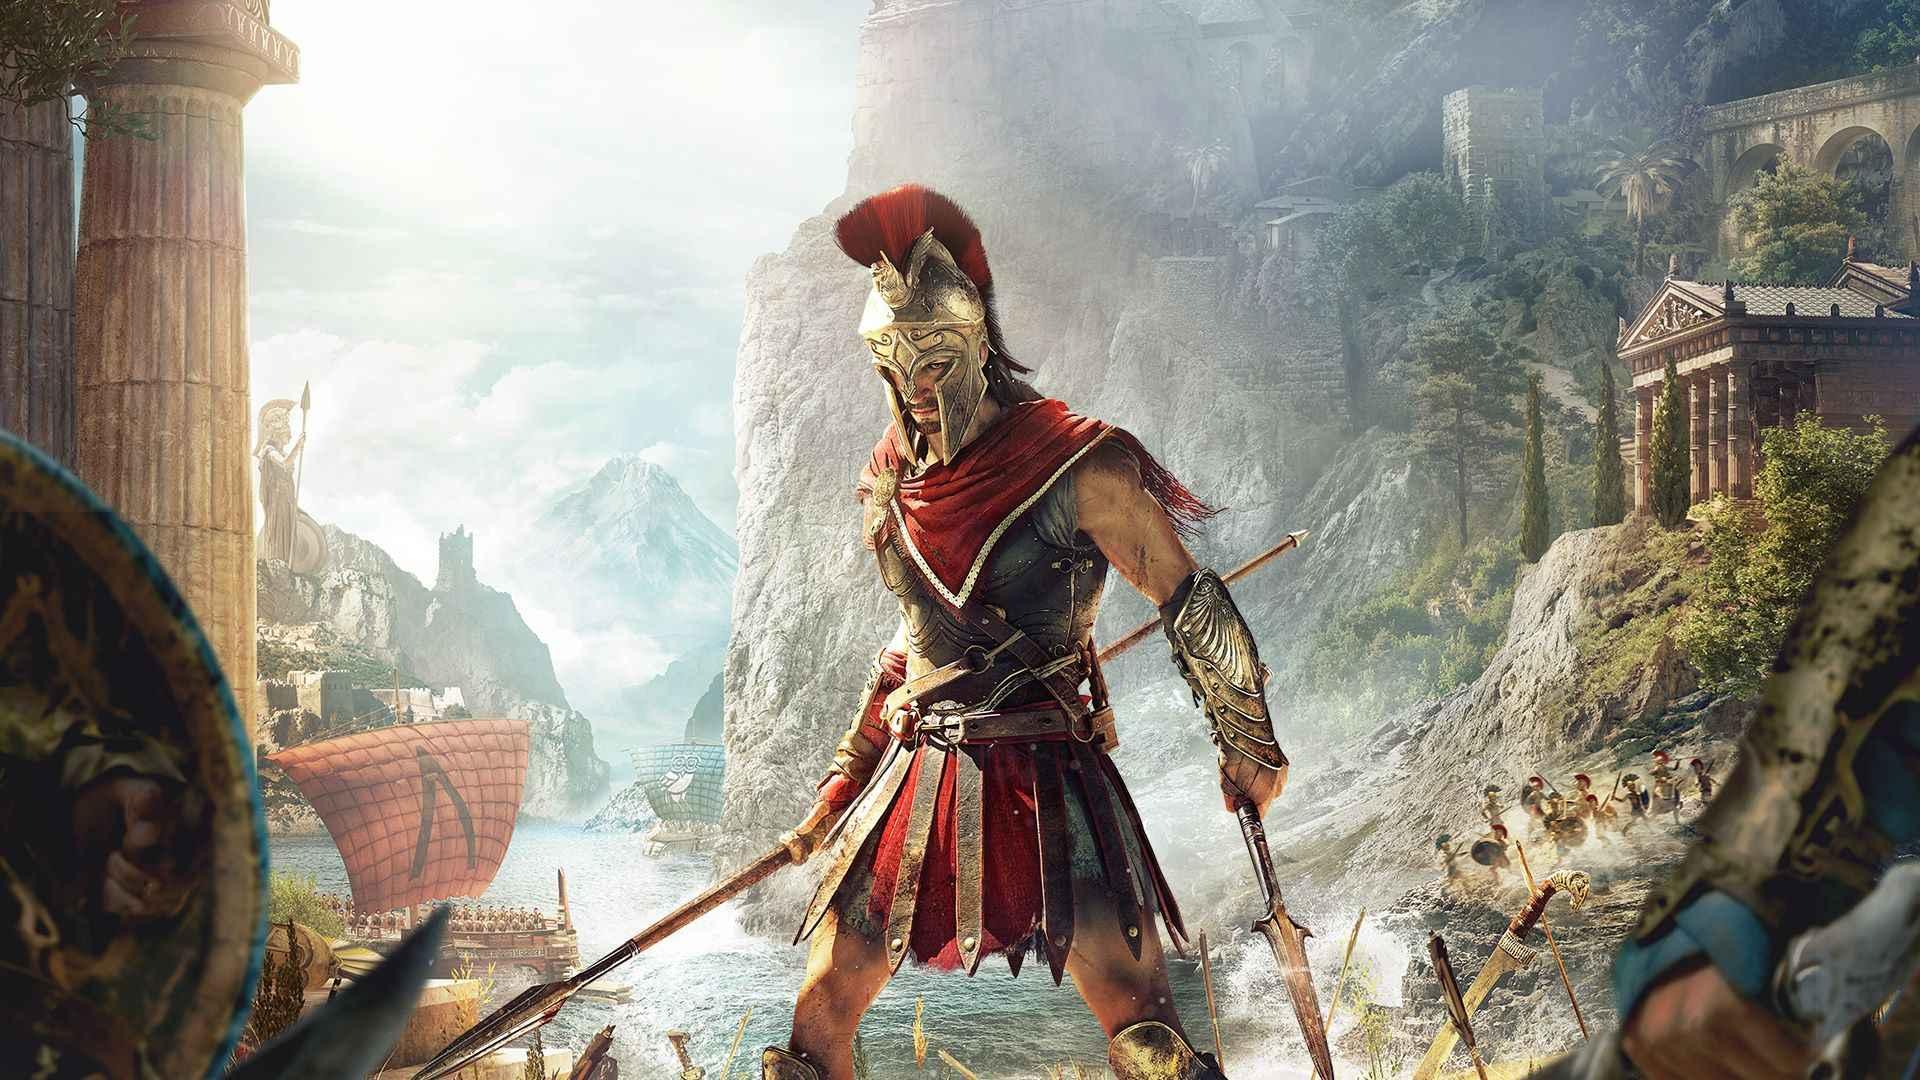 AssassinS Creed Kinox